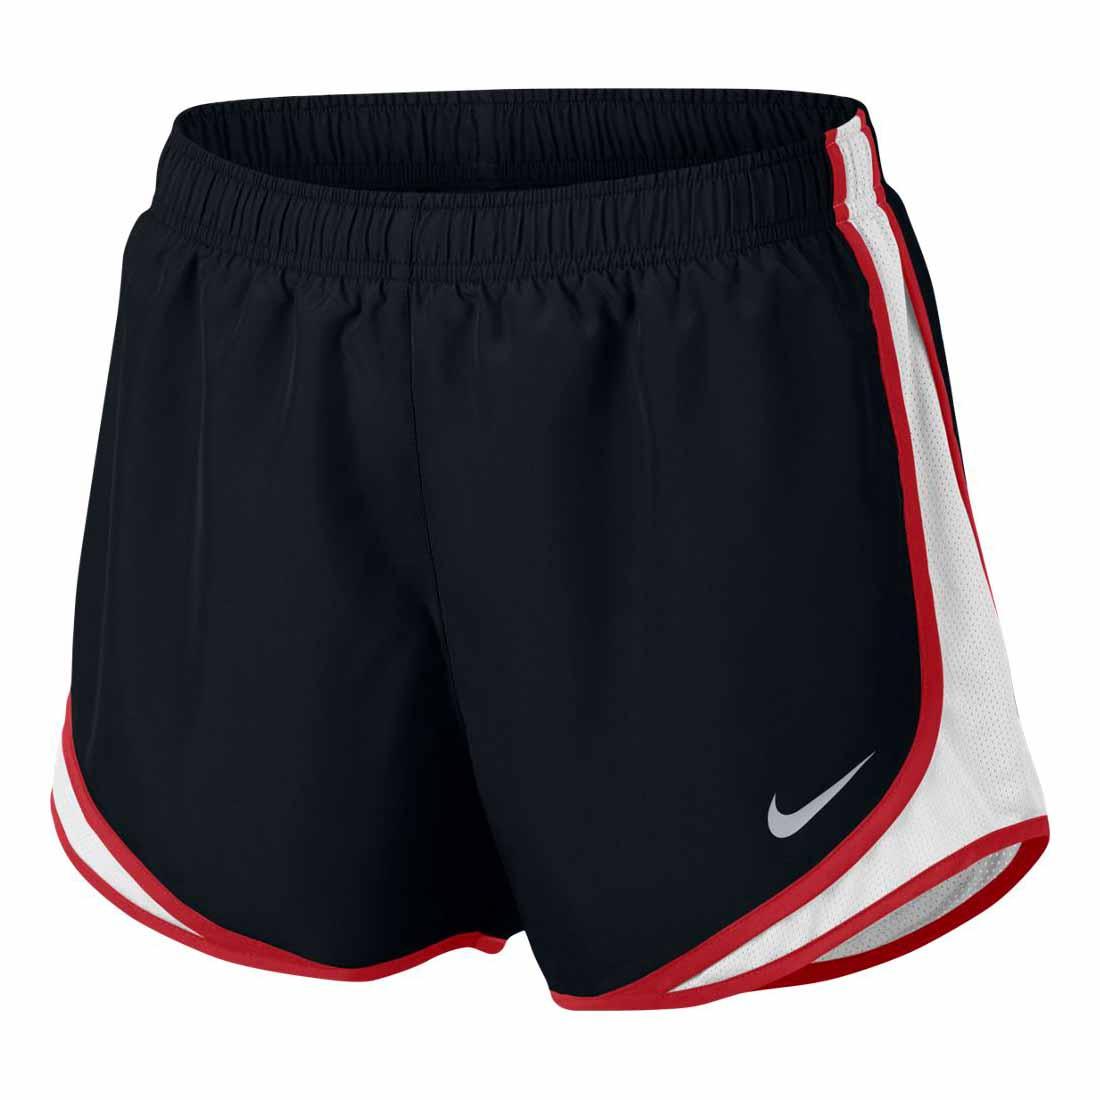 Women's Black/White/Sport Red Nike Tempo Running Shorts